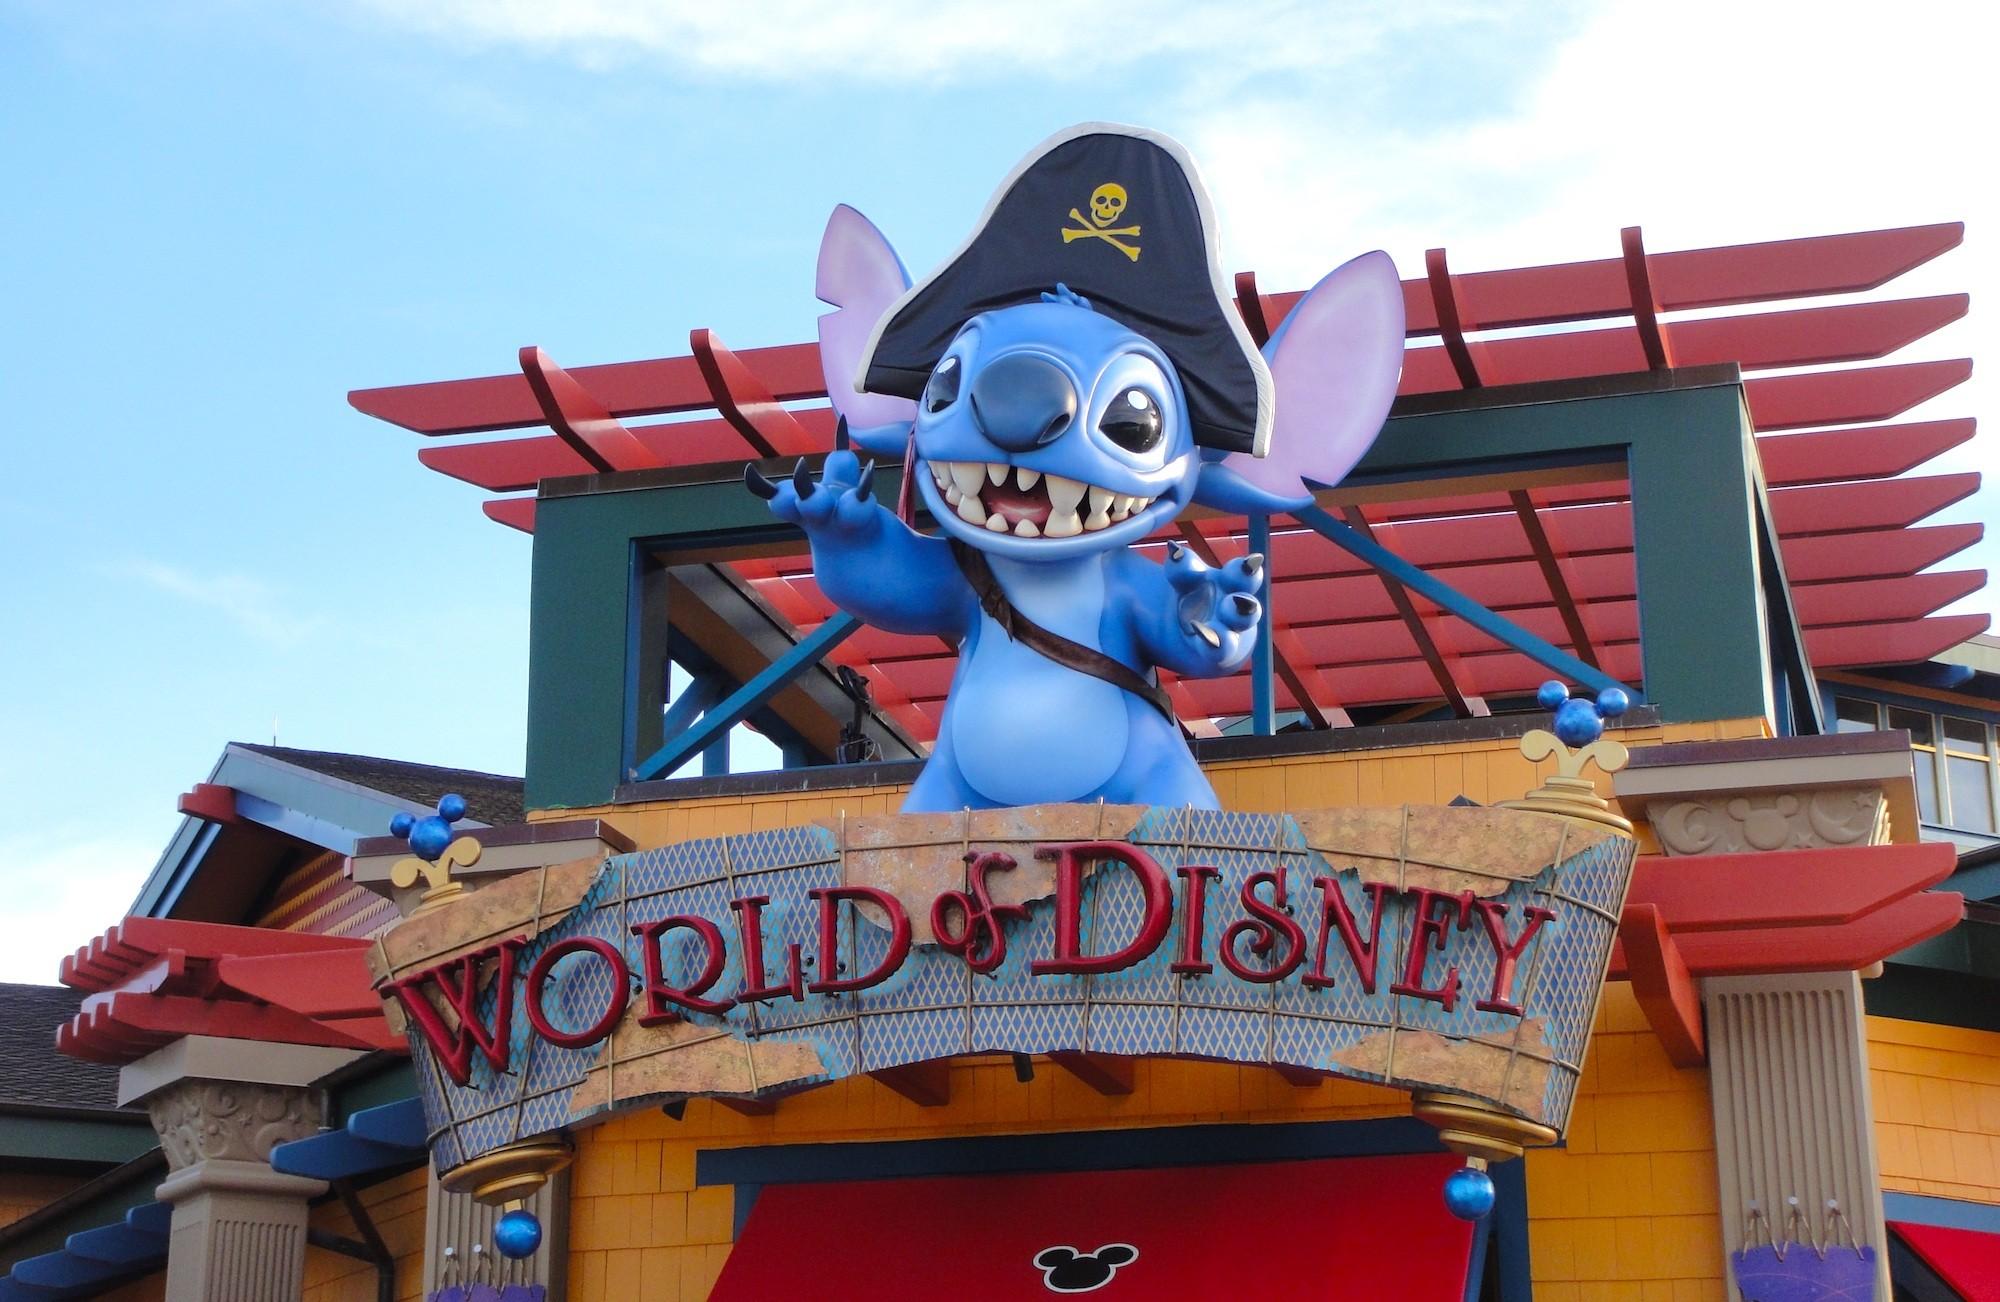 Florida World of Disney